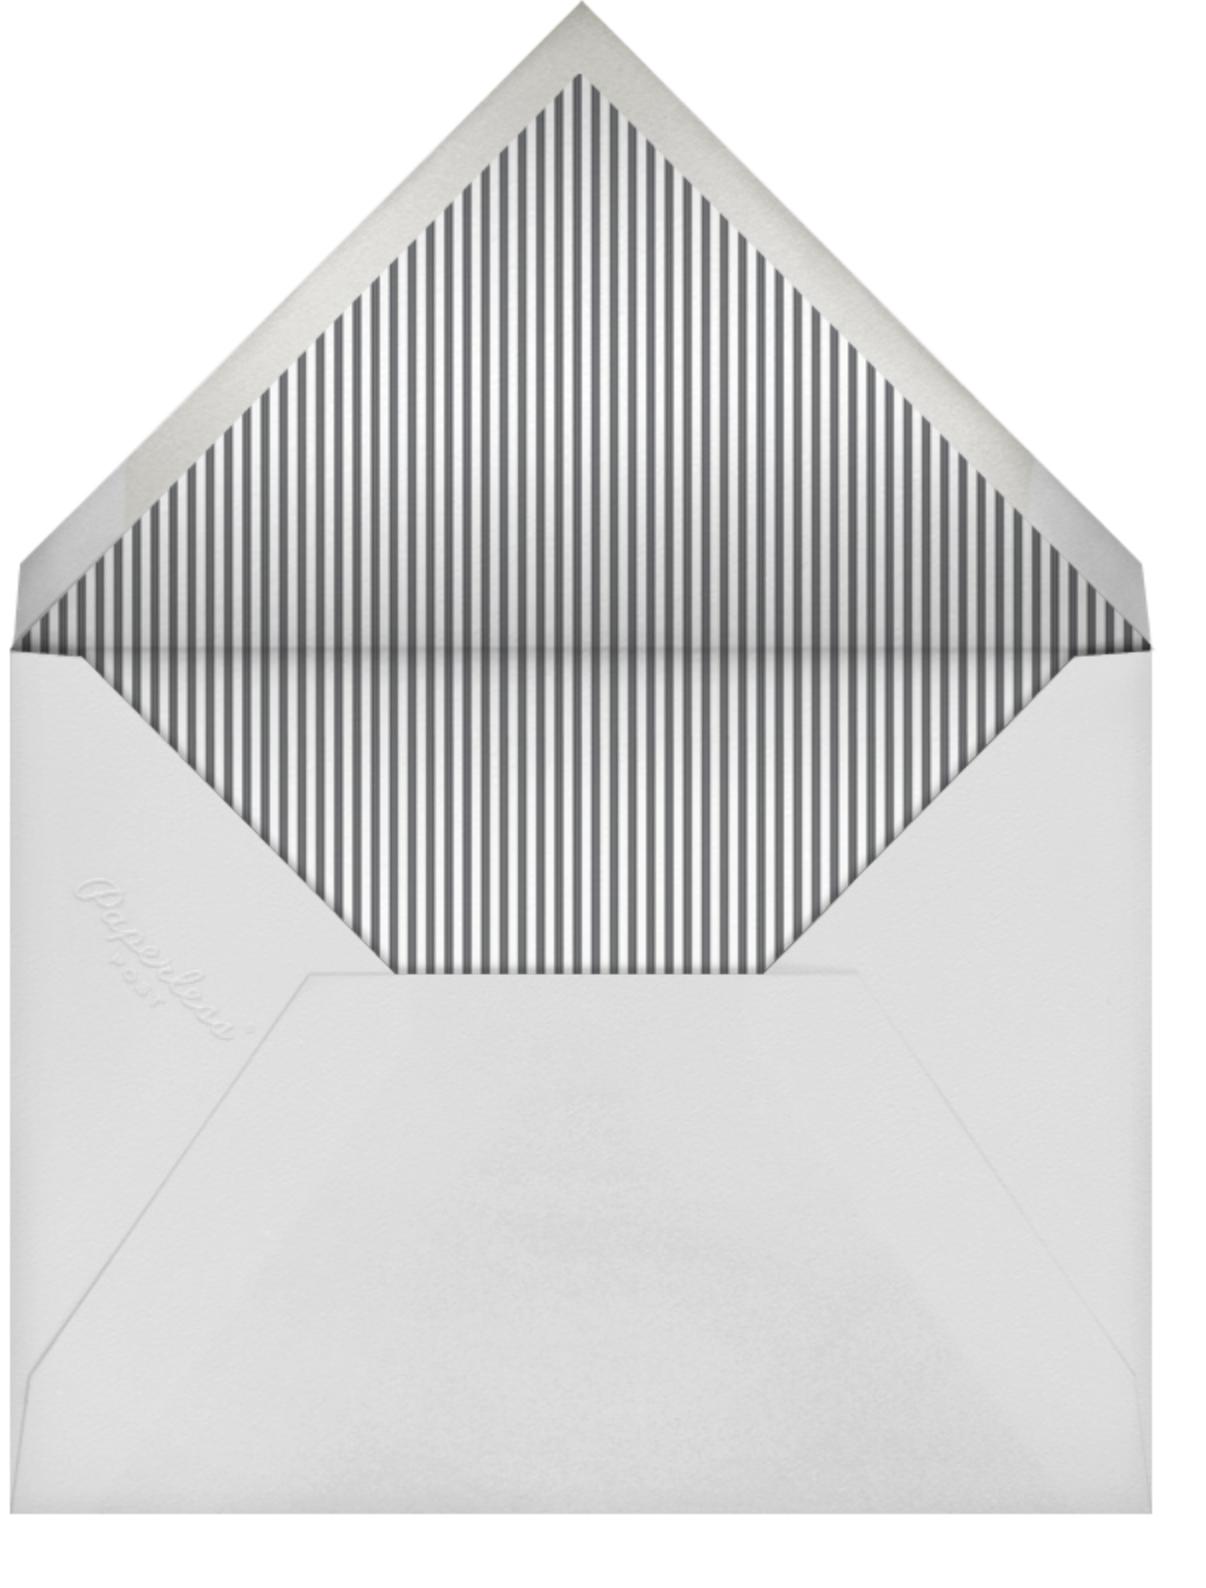 Signature Party - Charcoal - Sugar Paper - General entertaining - envelope back